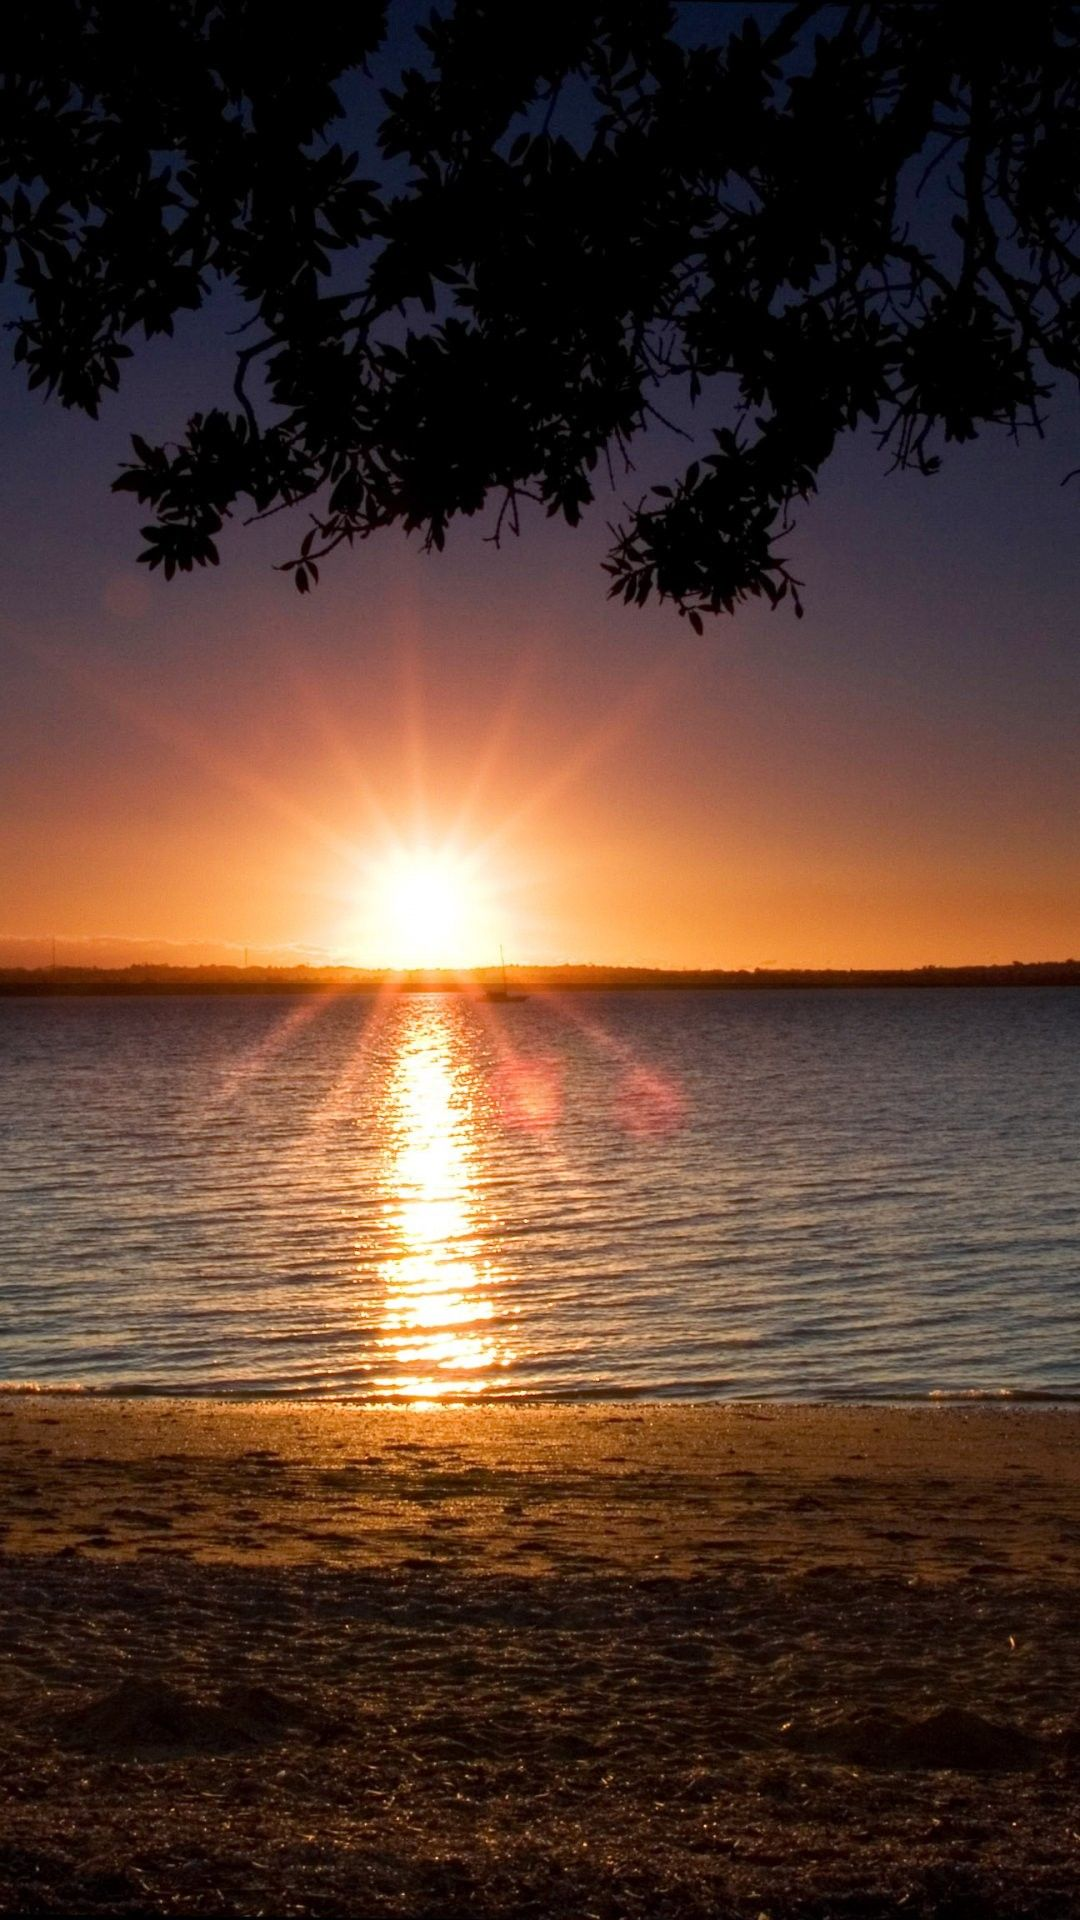 Beach Sunset iPhone 6 Plus Wallpaper 28818 Beach iPhone